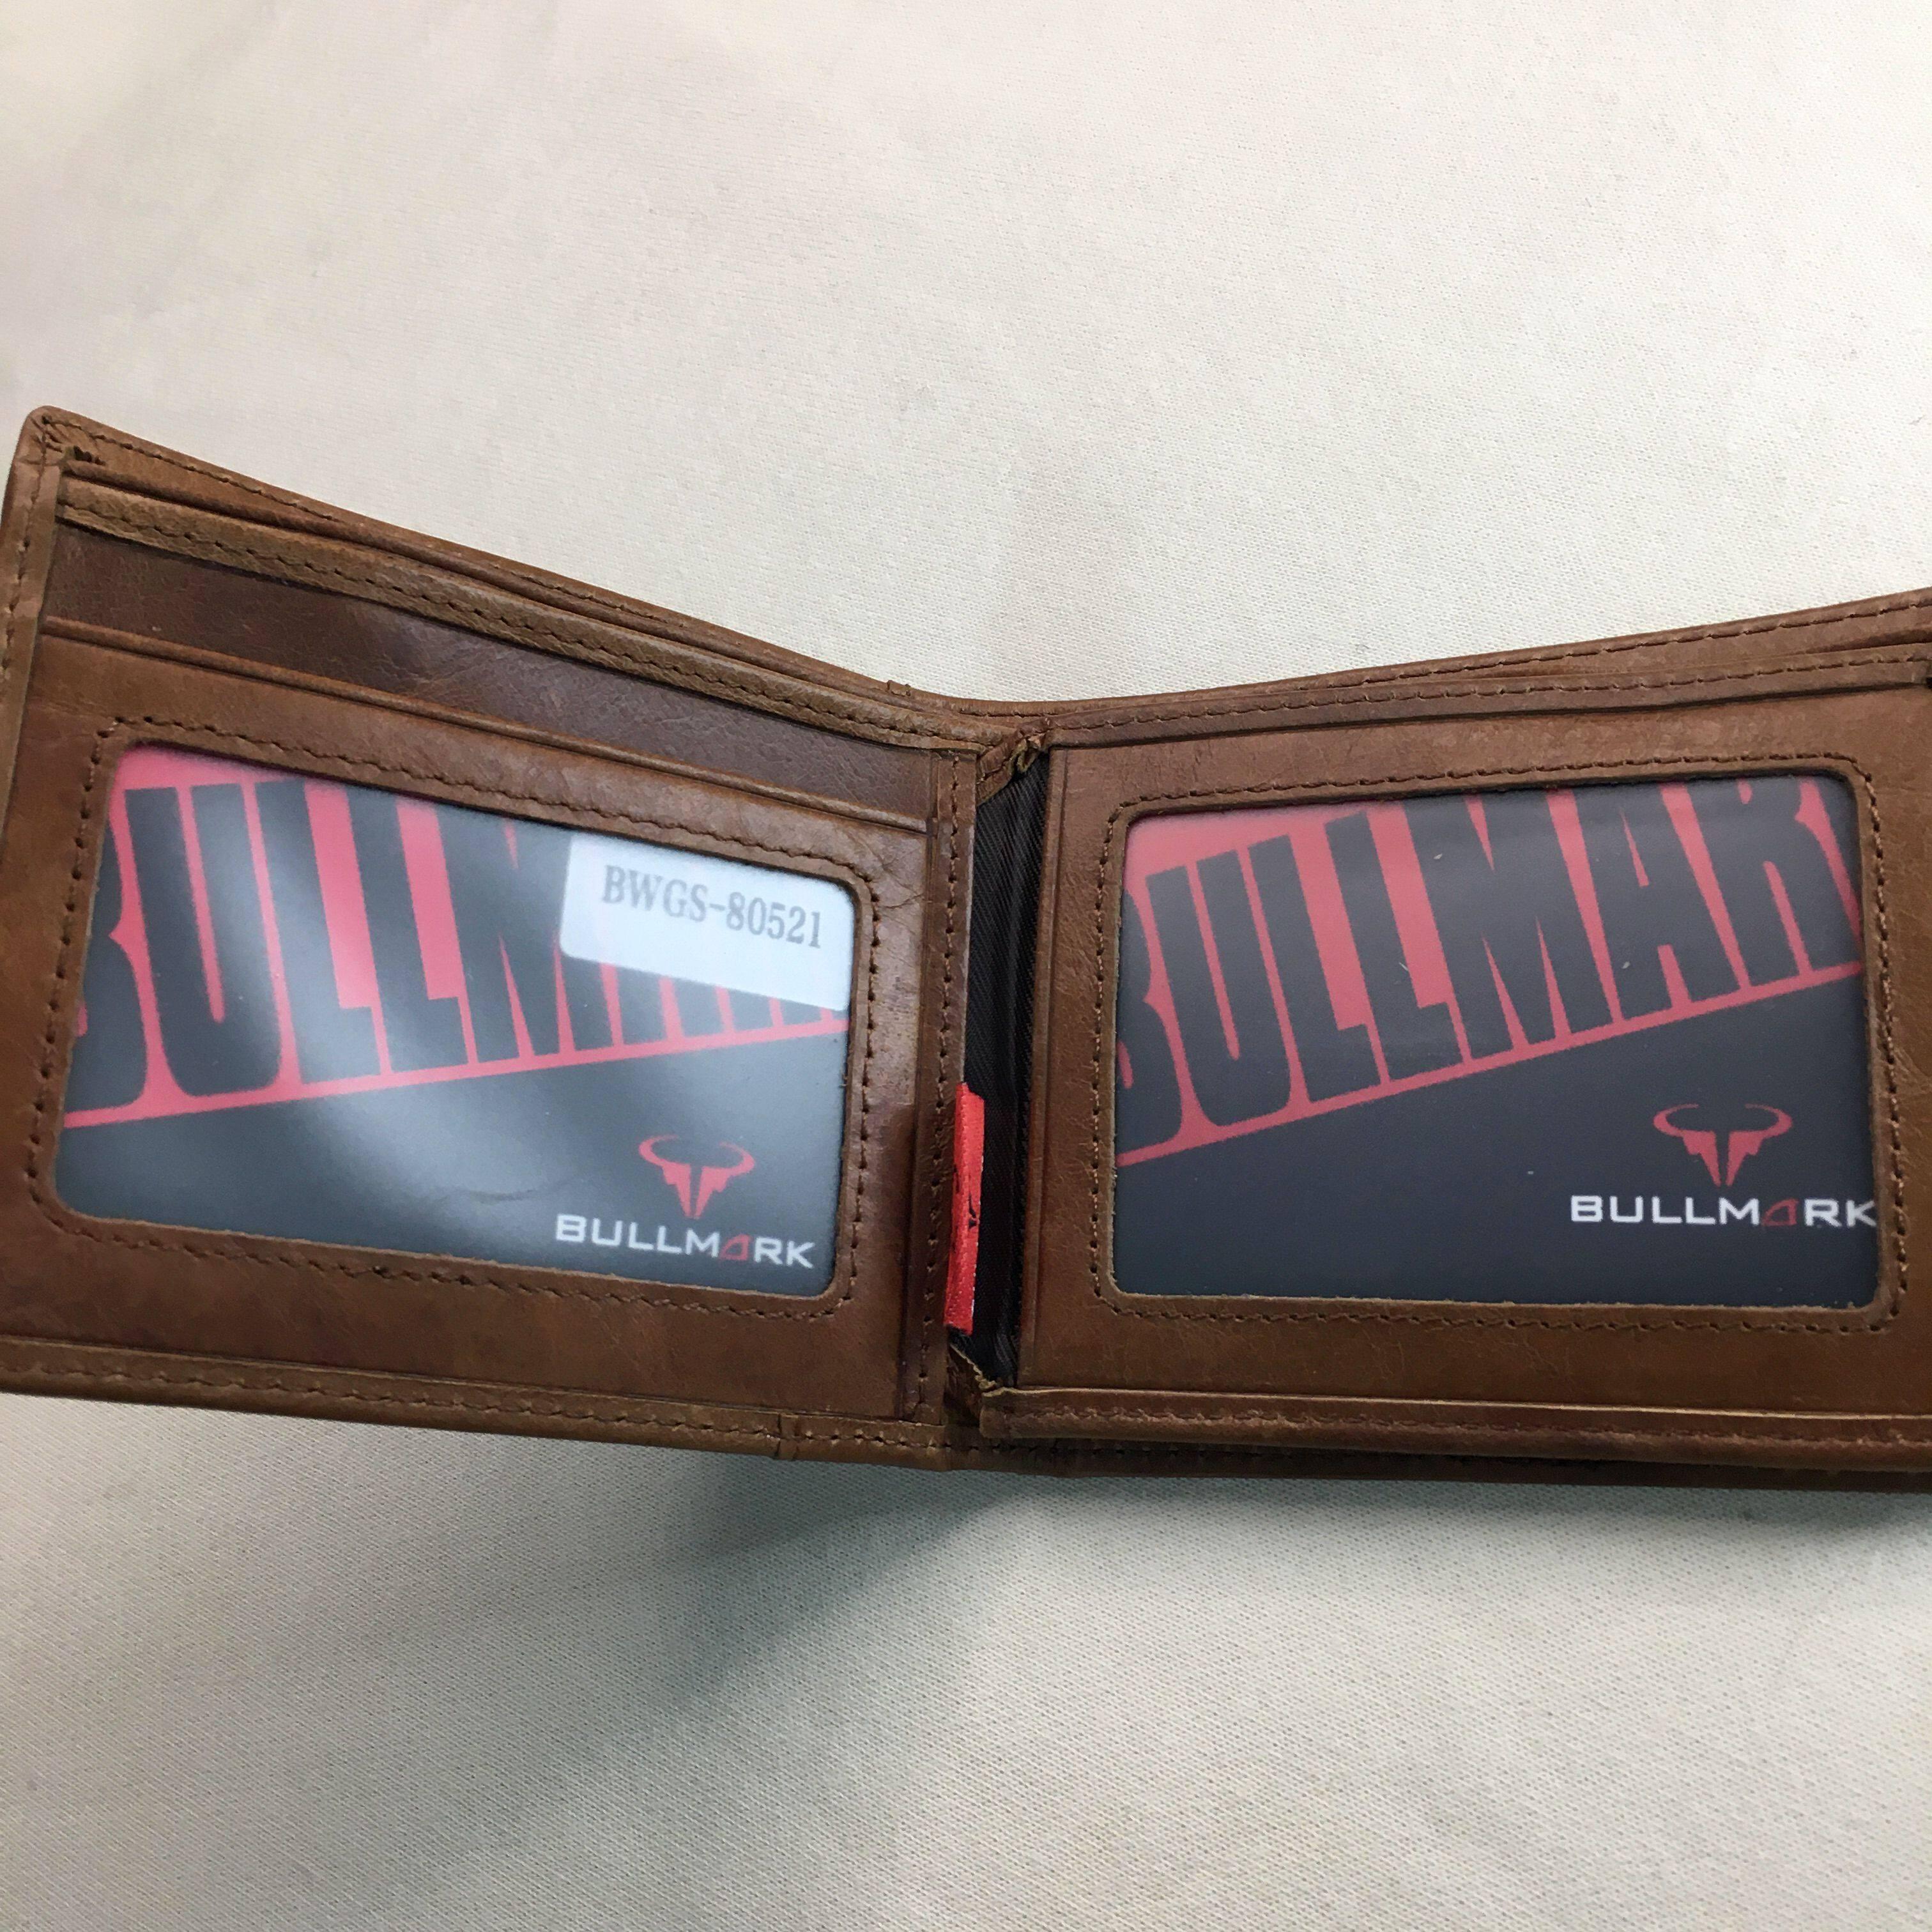 BULL MARK Genuine Cow Leather Wallet BWDG BWGS80521 British brown short Bifold